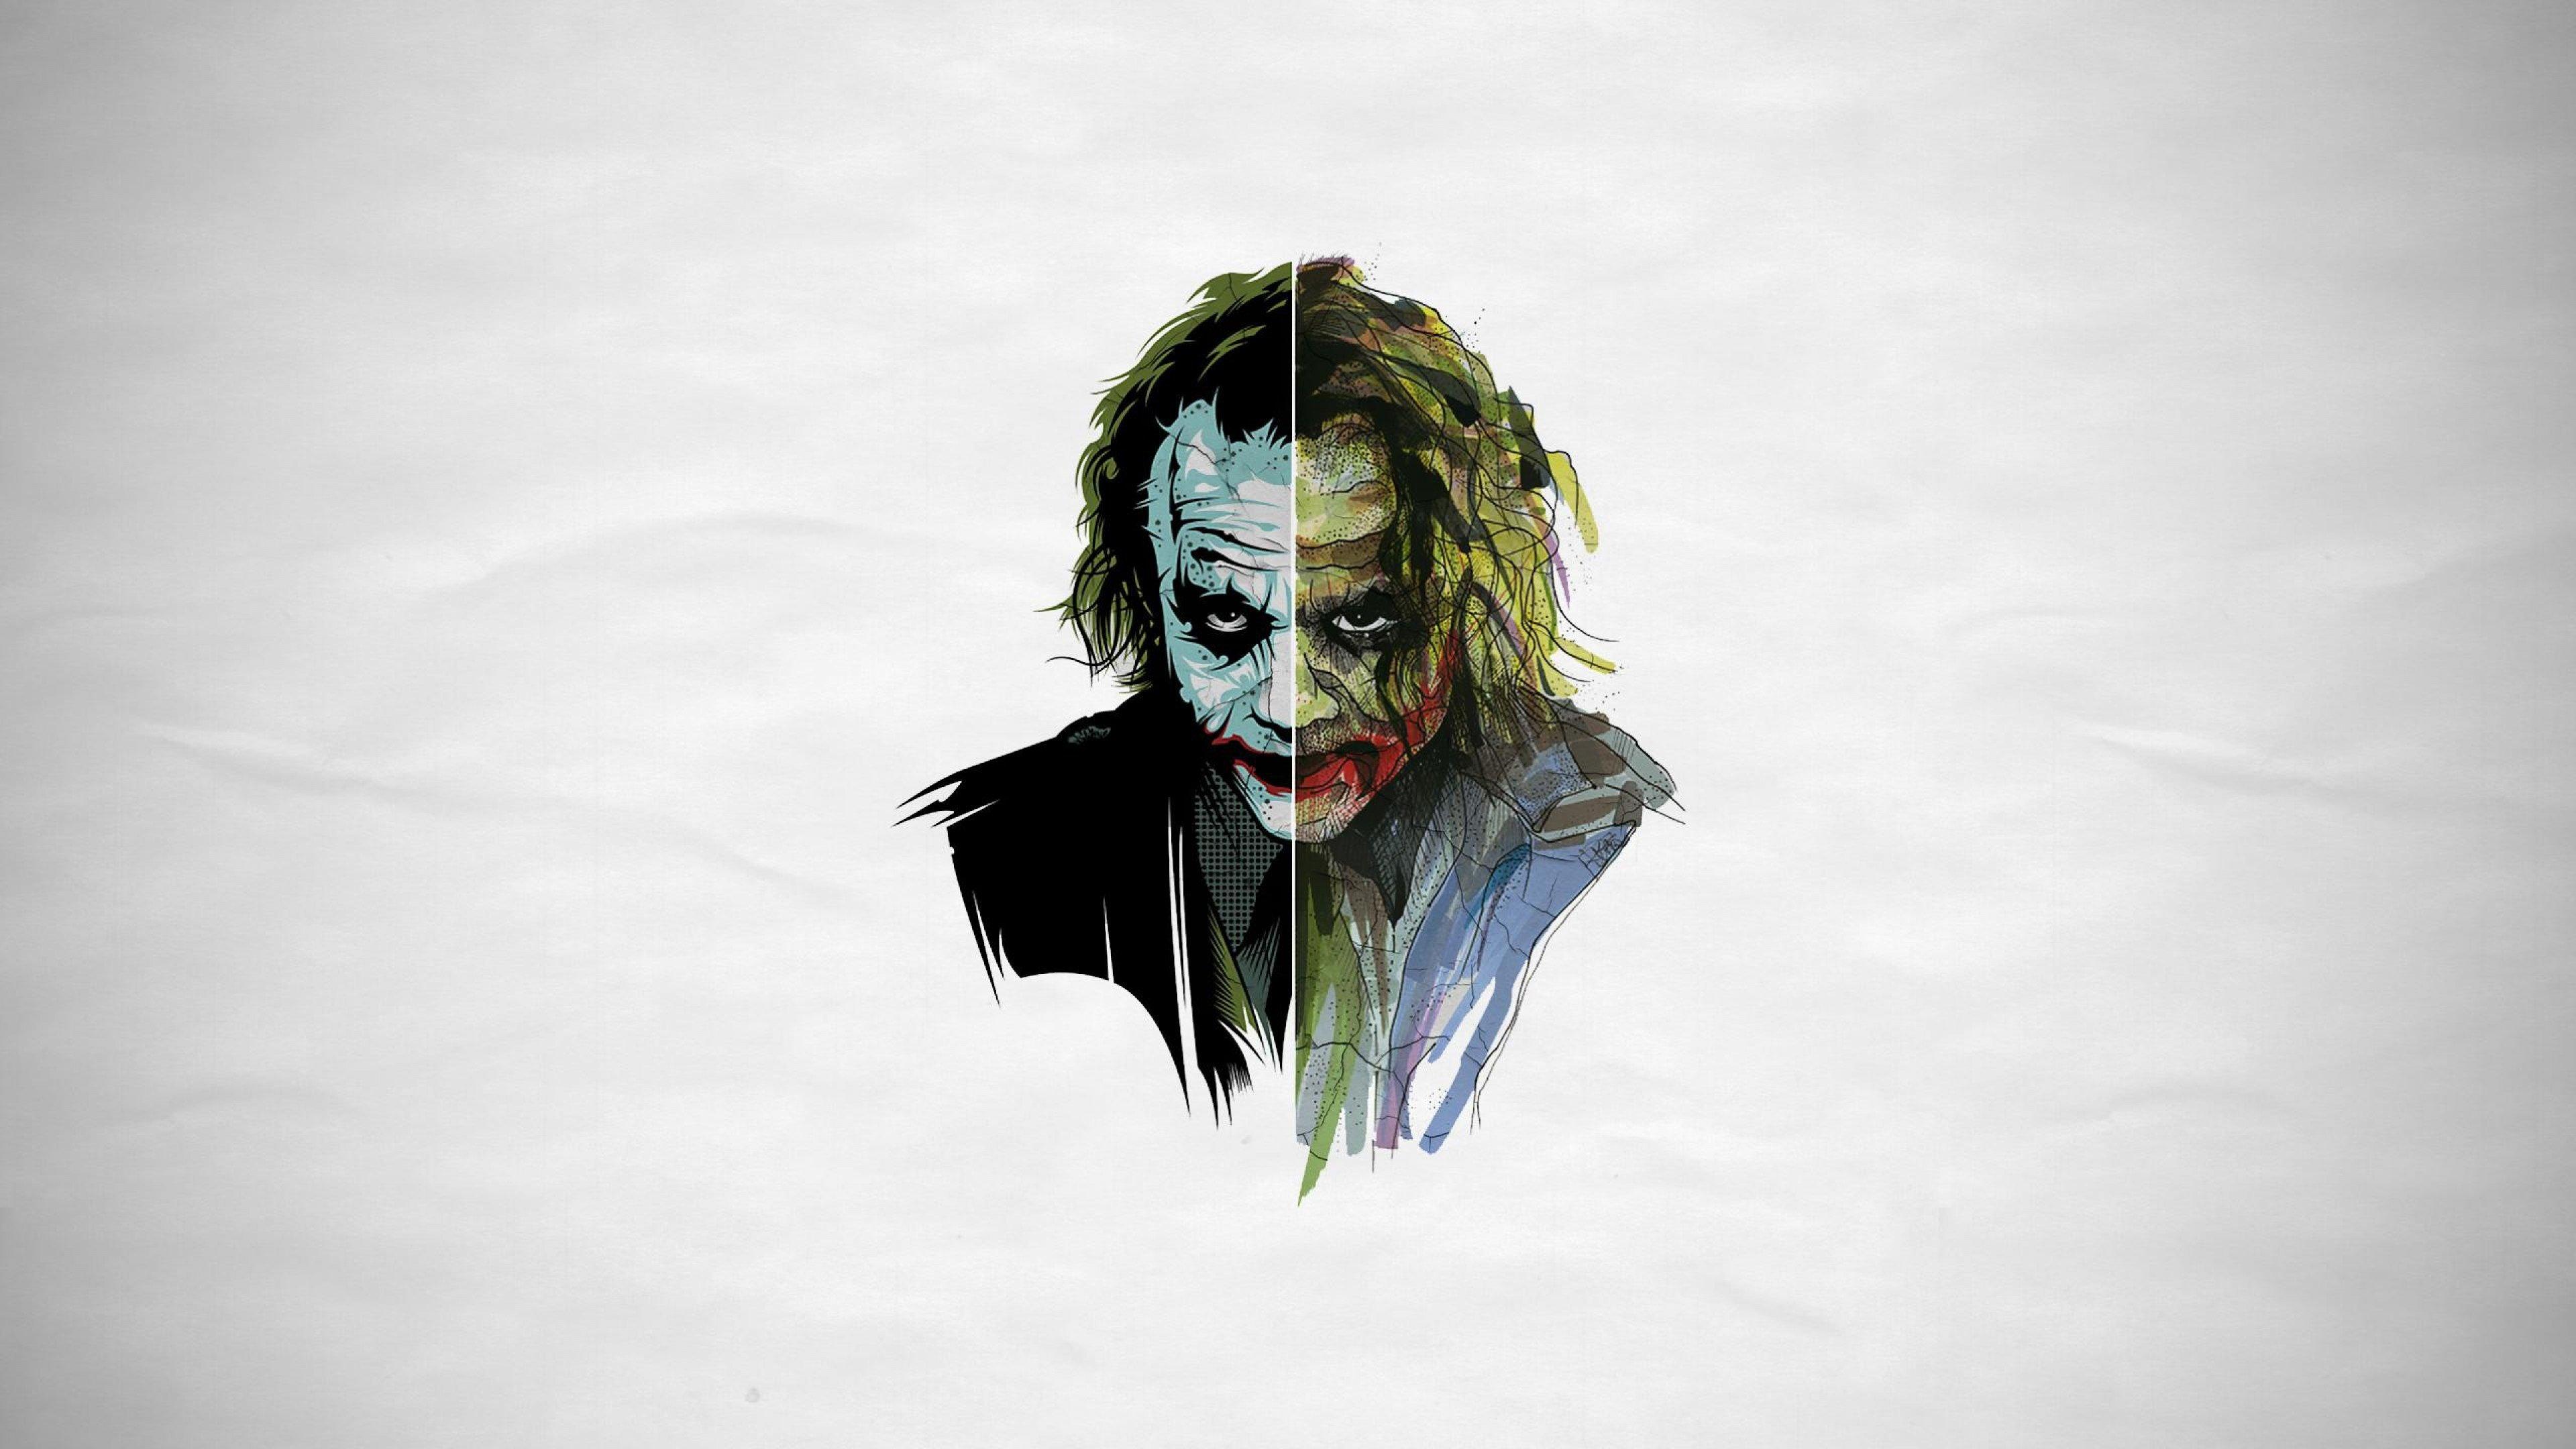 Joker 4k, HD Artist, 4k Wallpapers, Images, Backgrounds ...